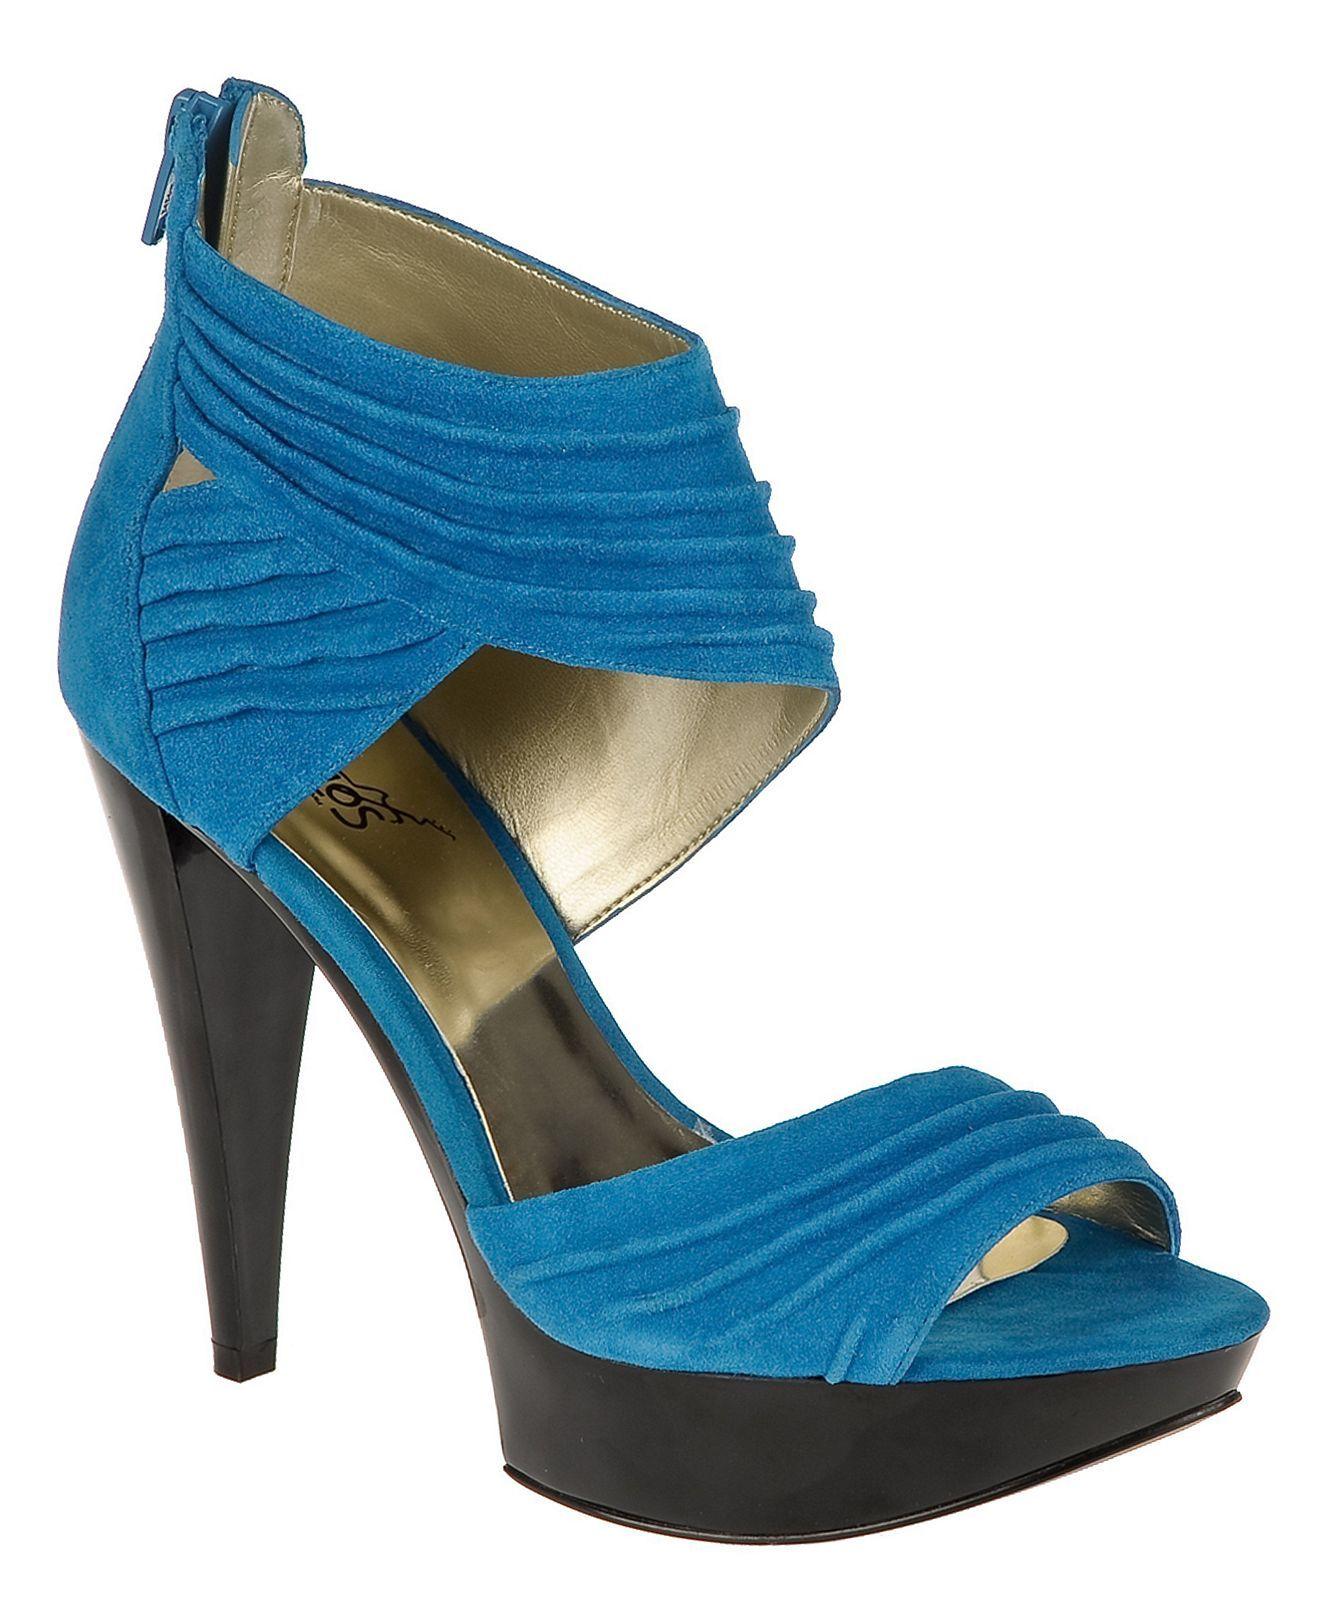 a6fe3d2fcfd6 need these Carlos Santana Shoes